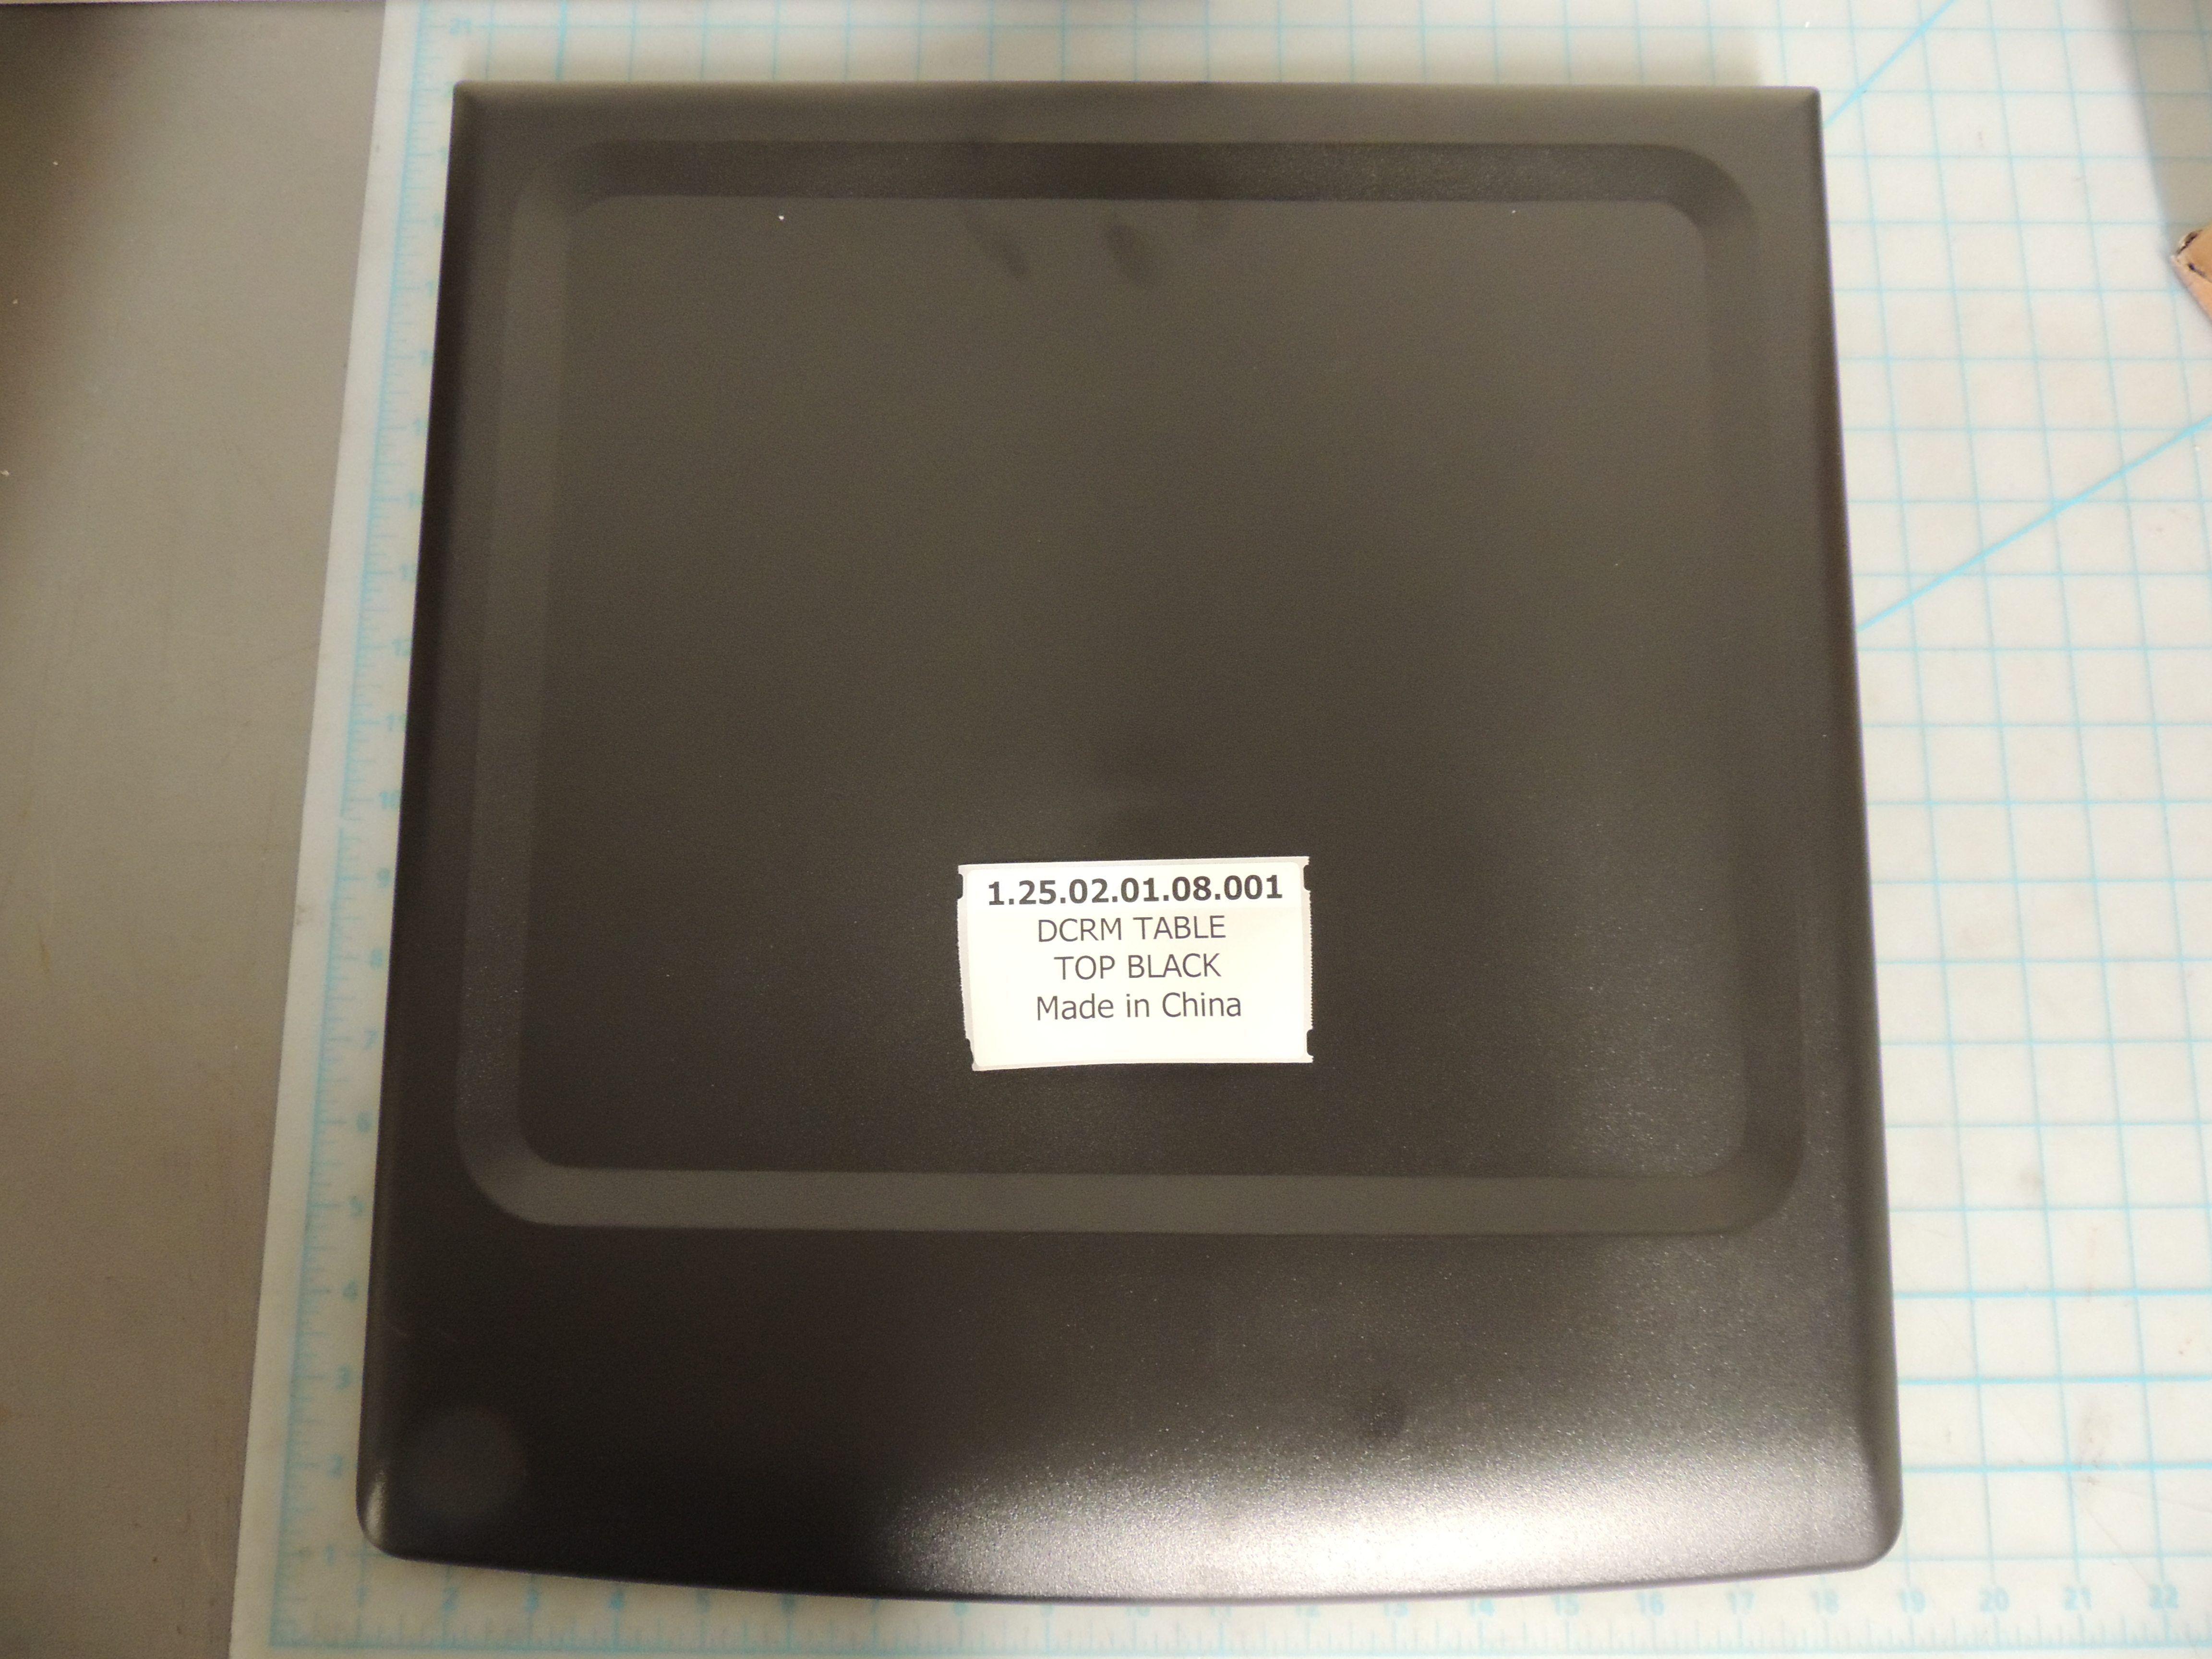 DCRM Table Top Black DAR017A2